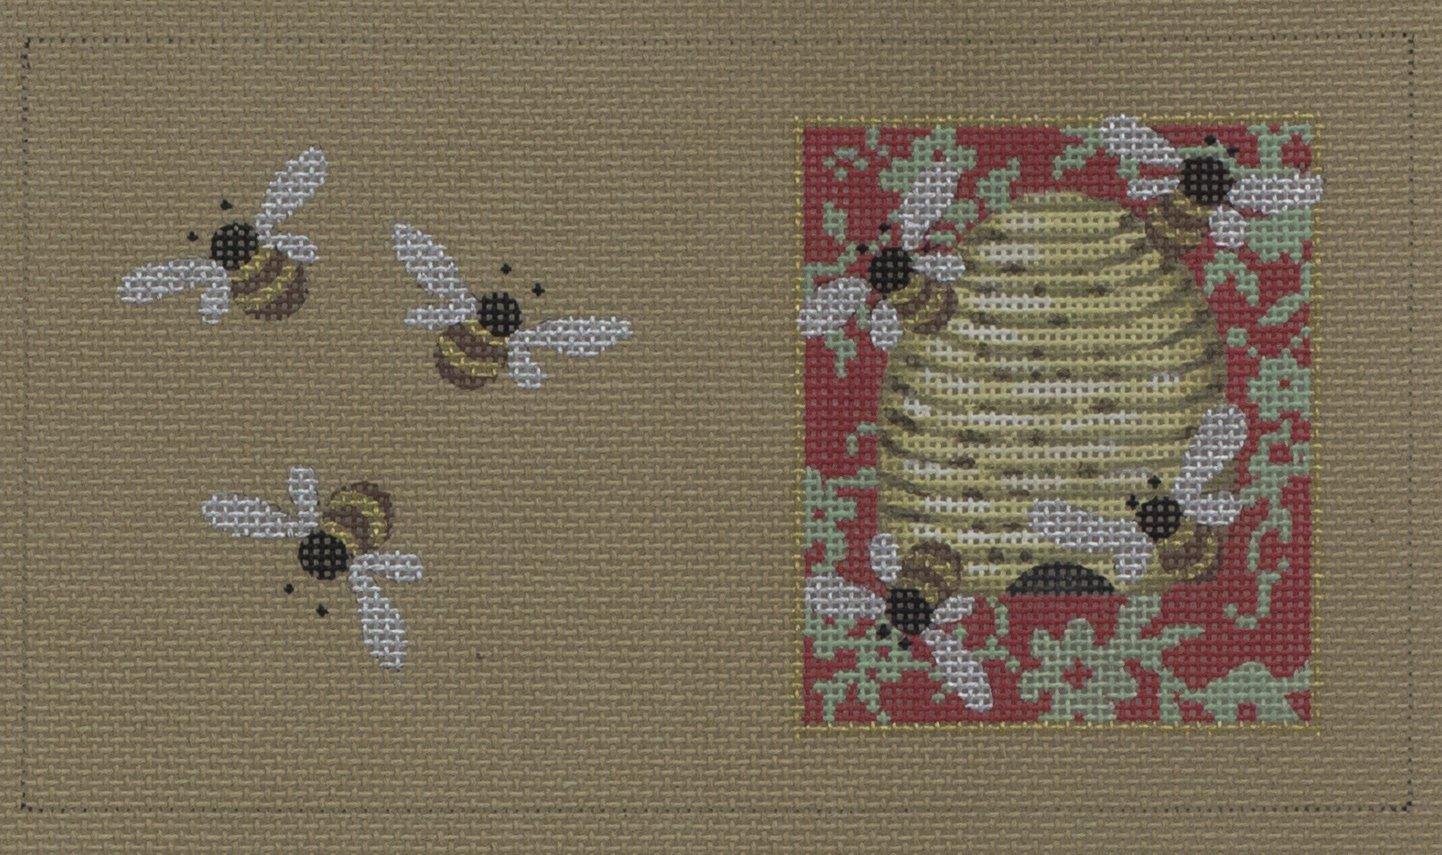 beehive needlecase